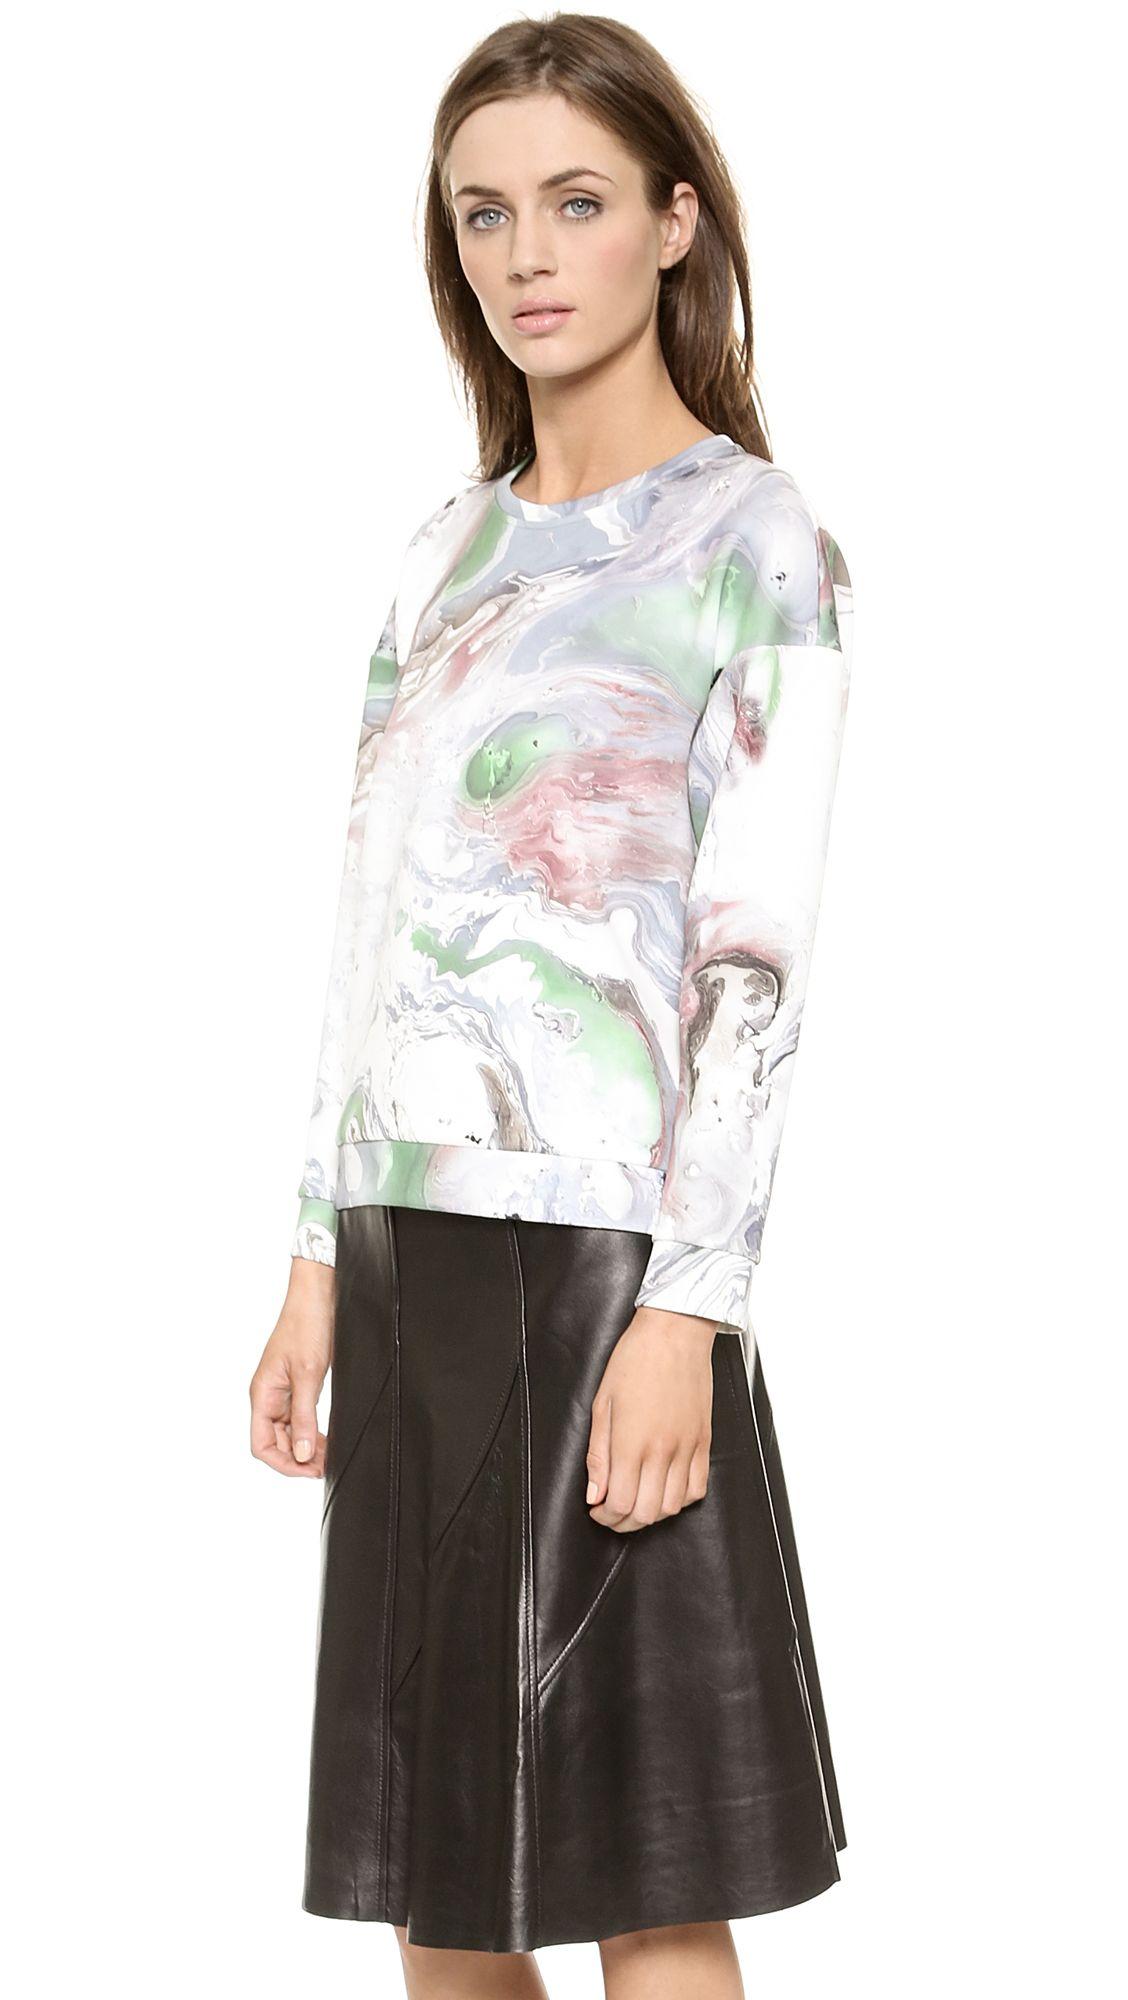 Etre Cecile Cheetah Insignia Short Sleeve Sweatshirt | SHOPBOP